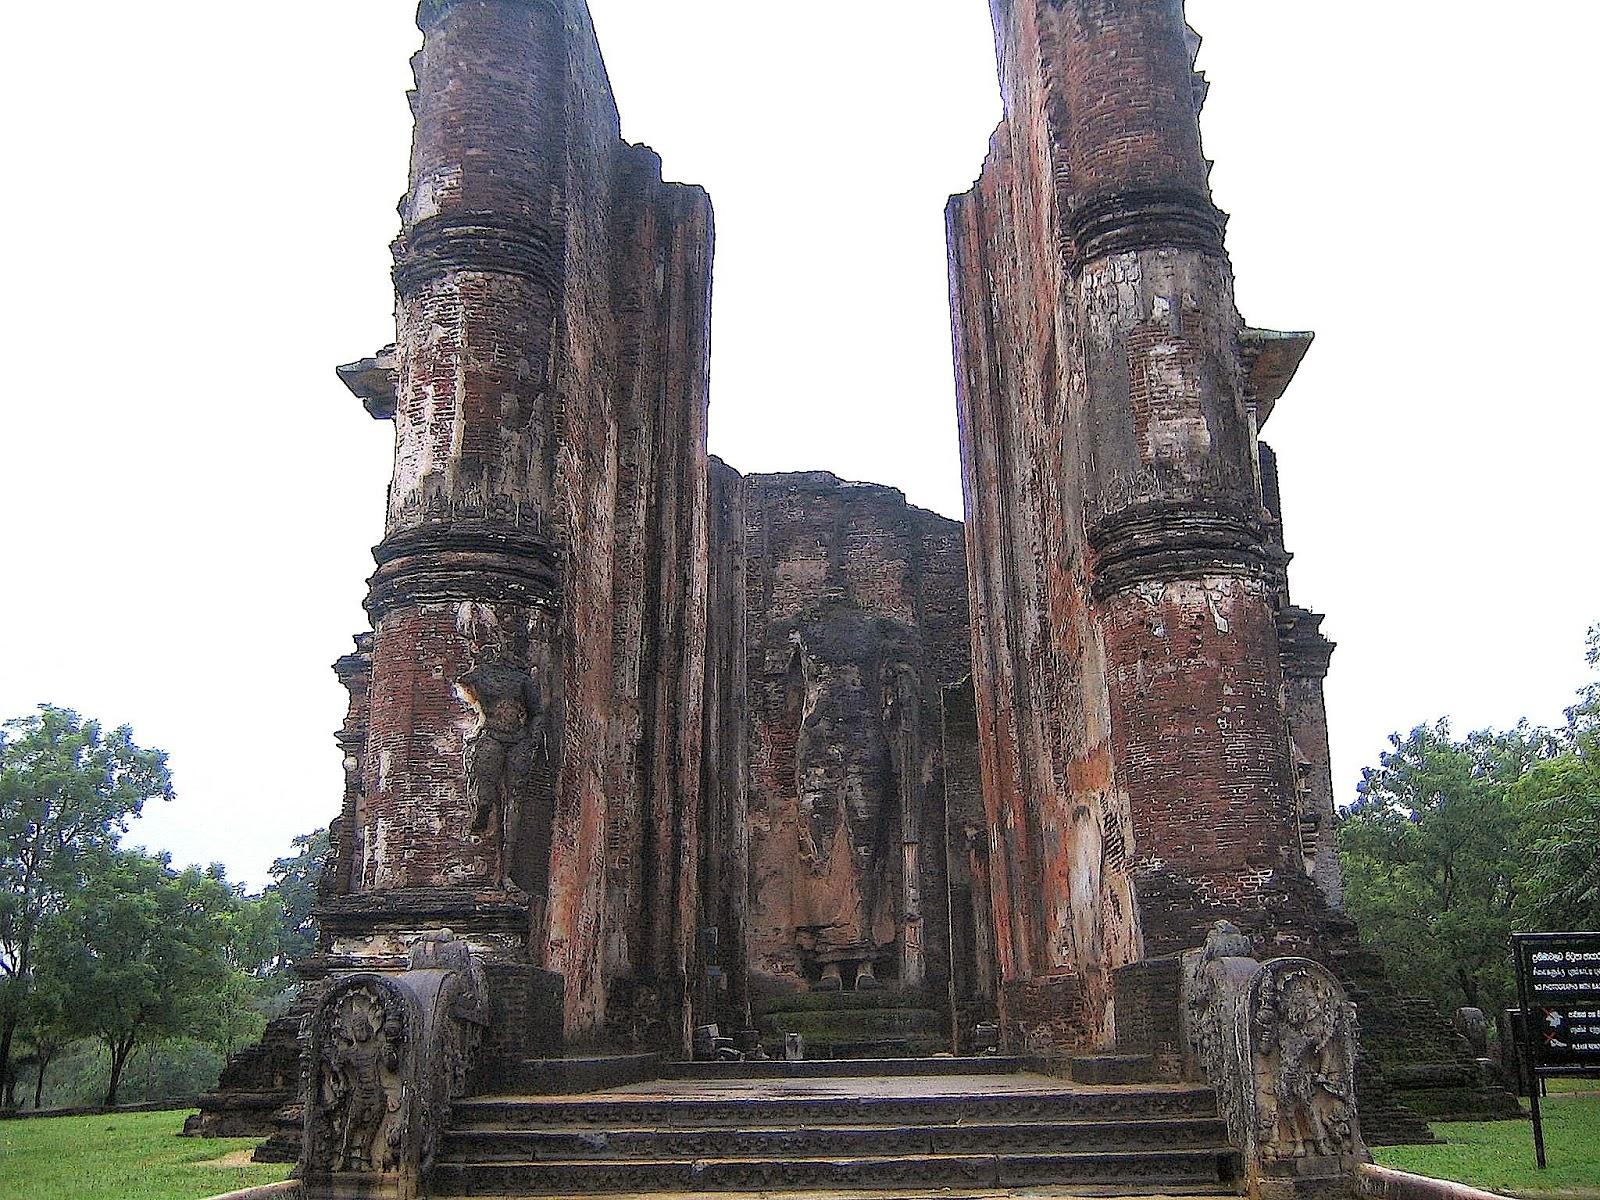 Lankathilaka Vihara, Polonnaruwa, Sri Lanka